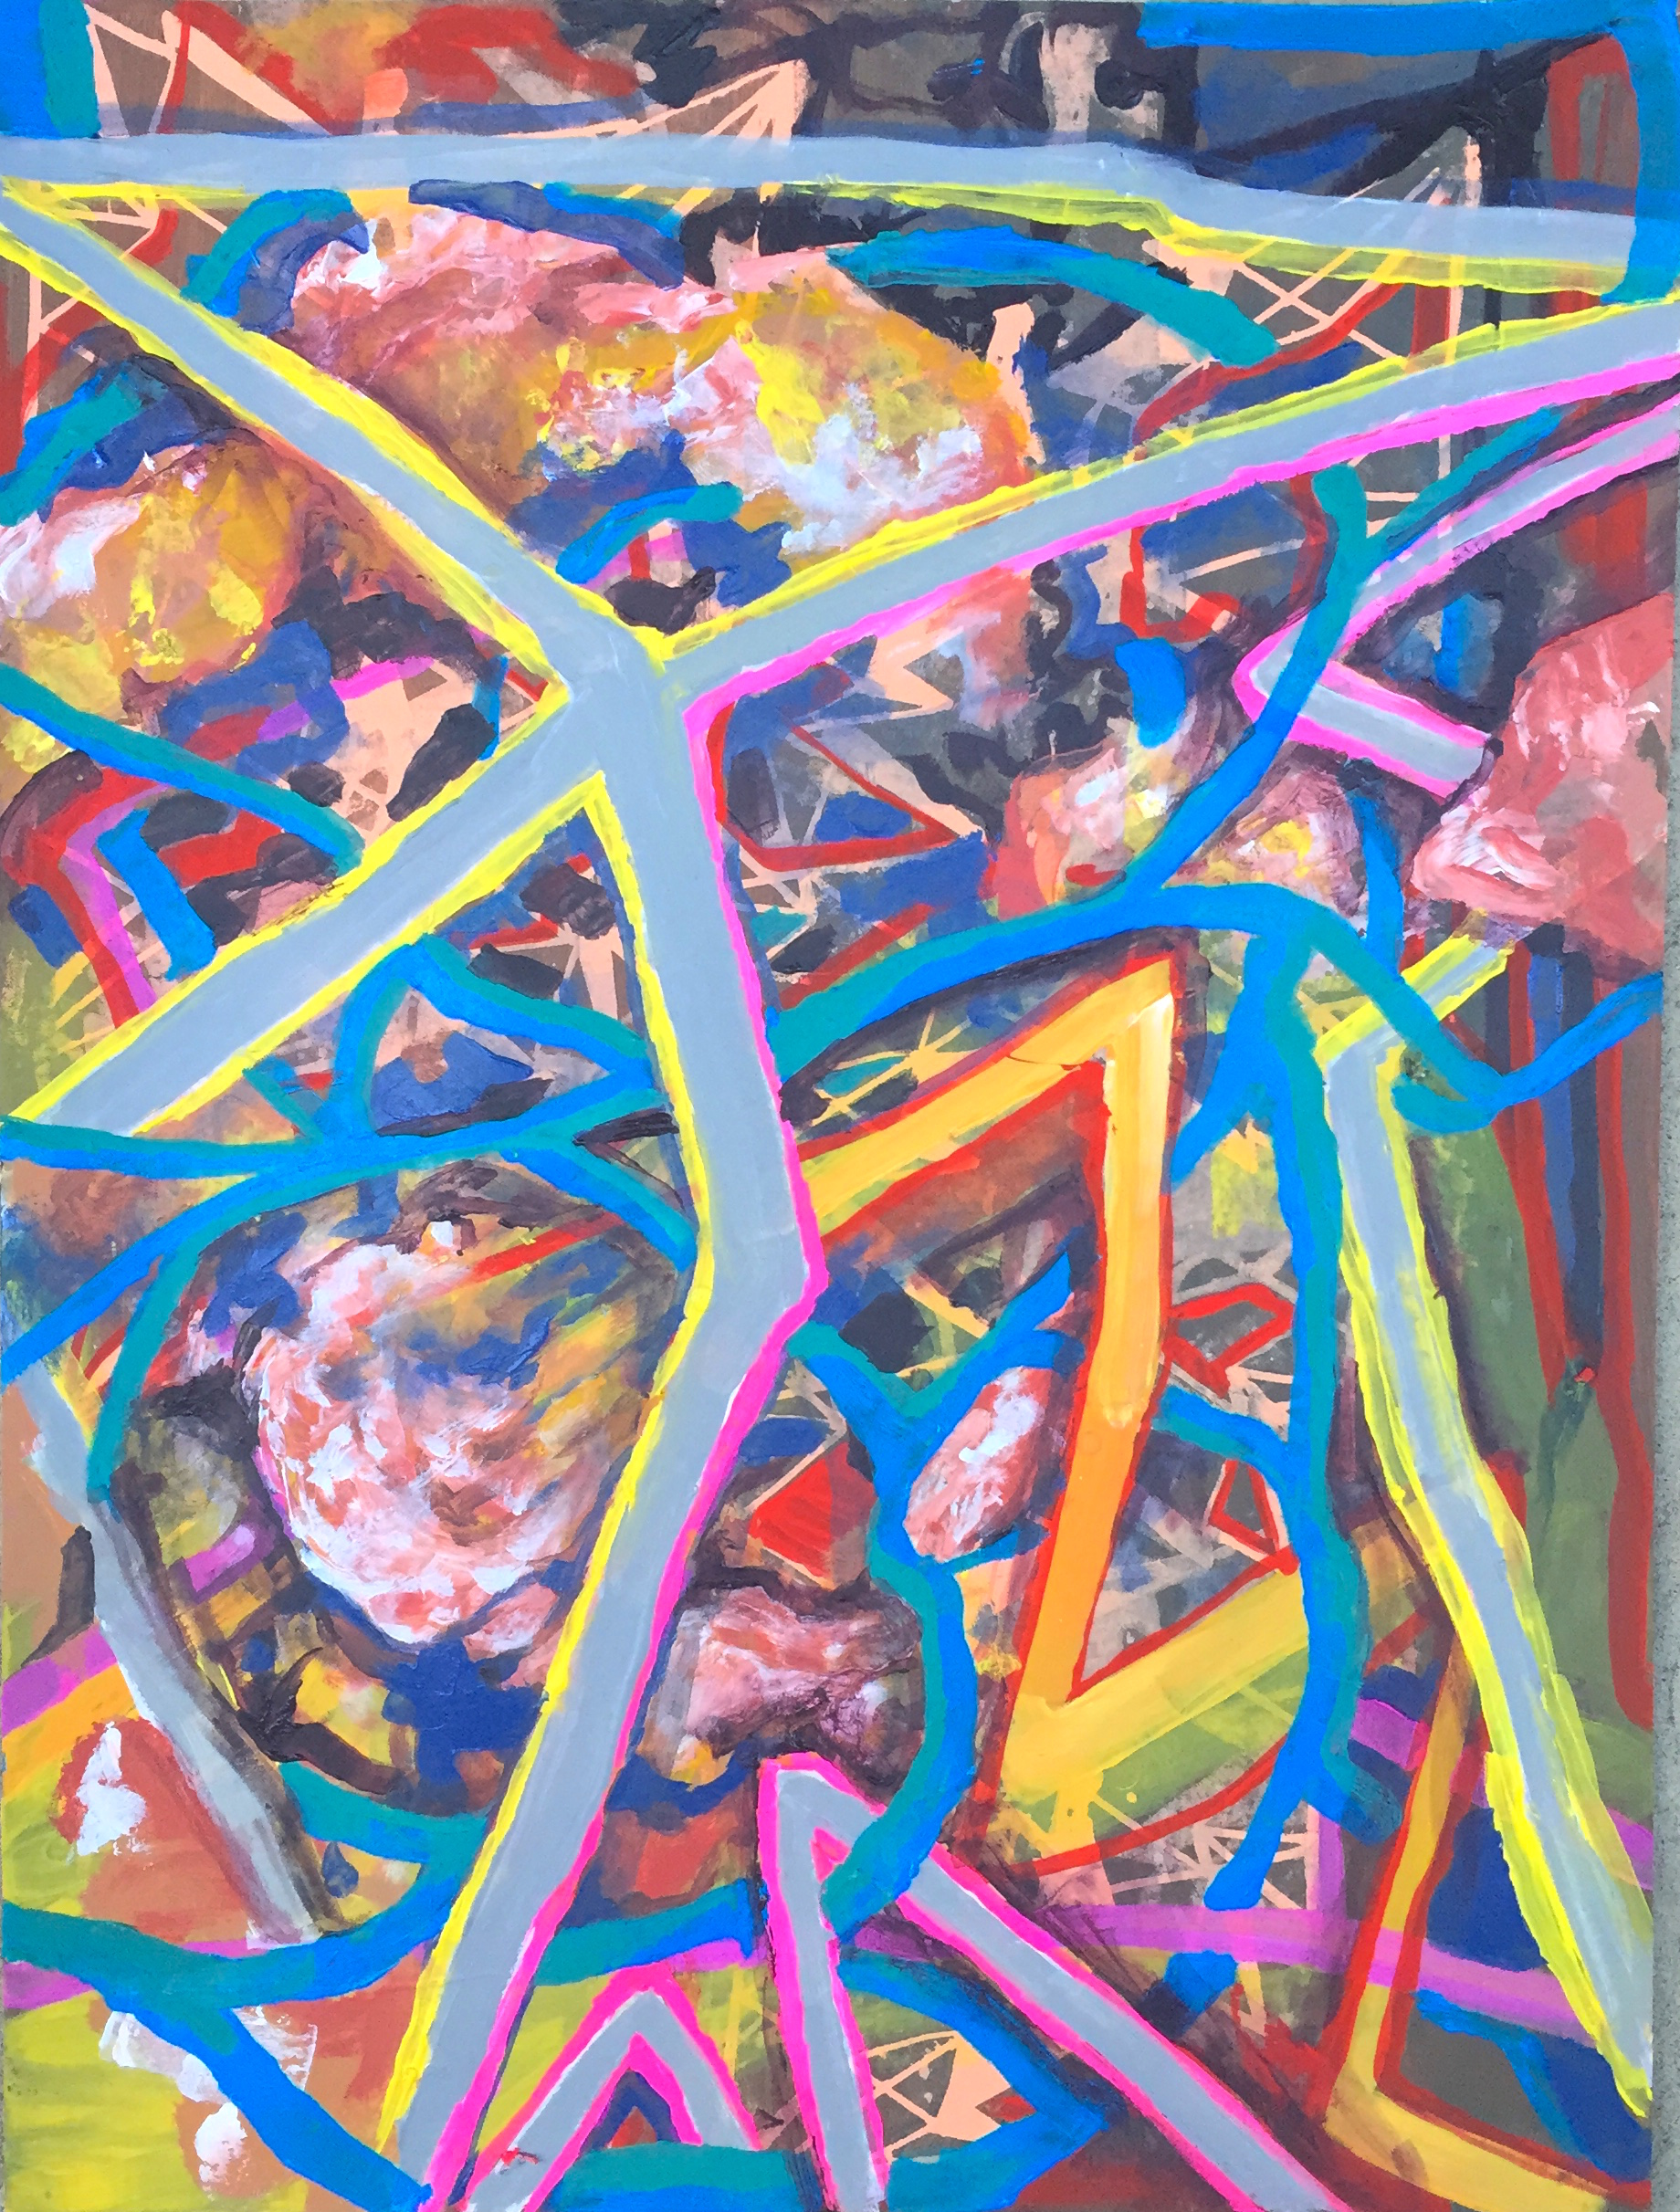 "Zipline Tangle, mixed media on paper, 24"" x 18"", 2015"